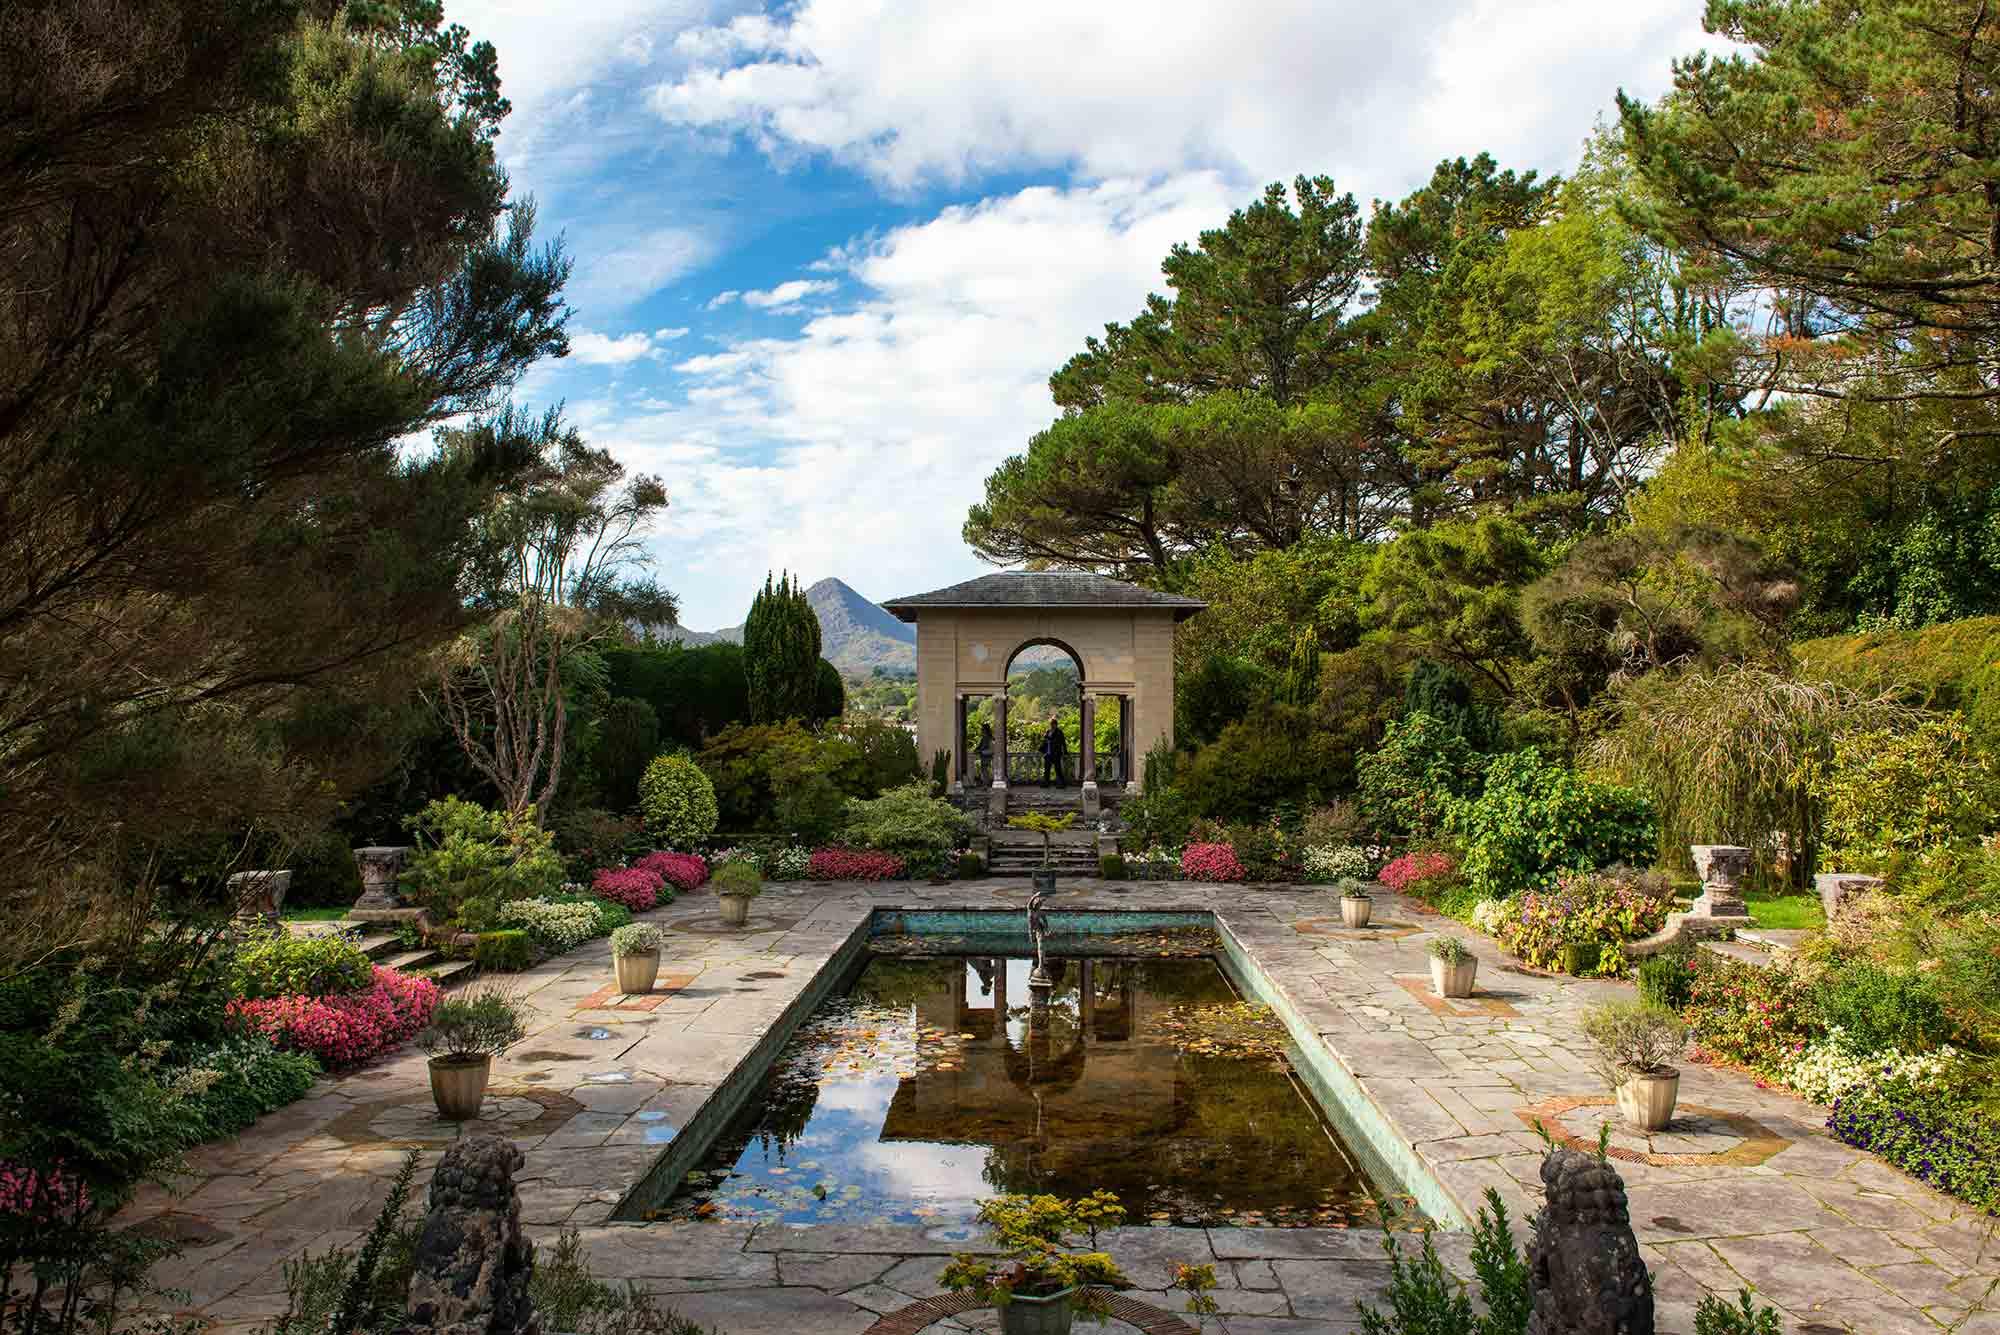 The pond in the Italian garden